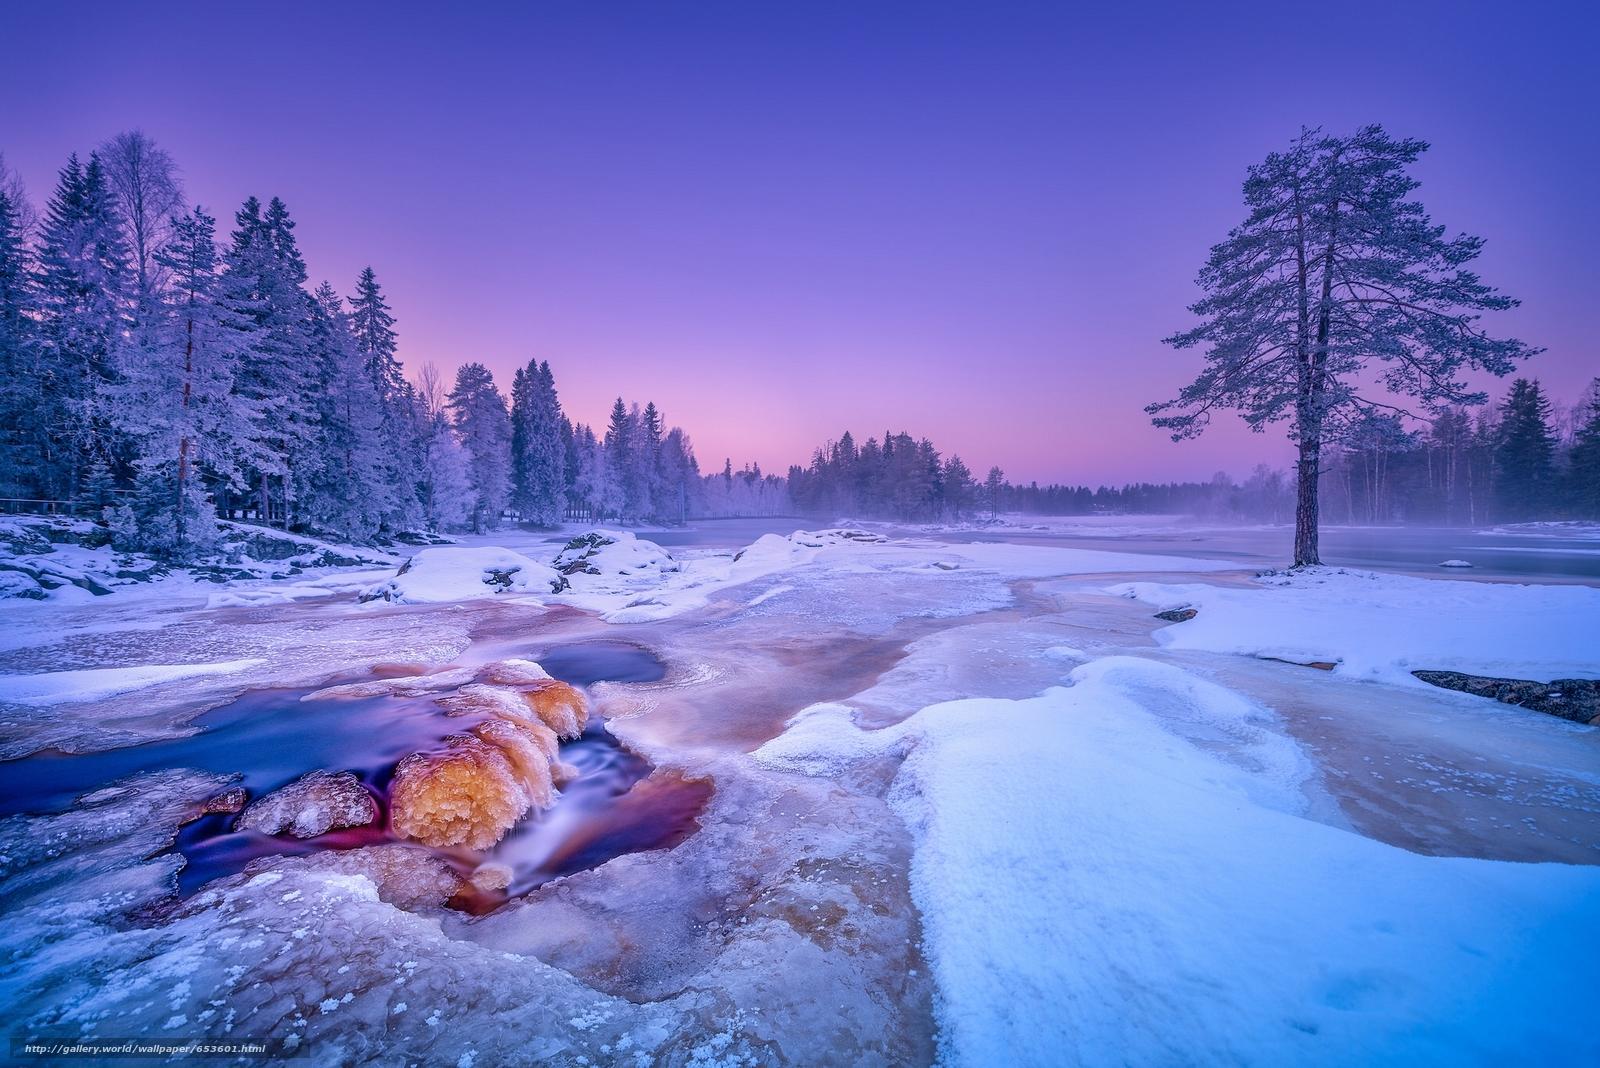 Descargar gratis Río Kiiminkijoki,  Finlandia,  Río Kiiminkiyoki,  Finlandia Fondos de escritorio en la resolucin 2048x1367 — imagen №653601